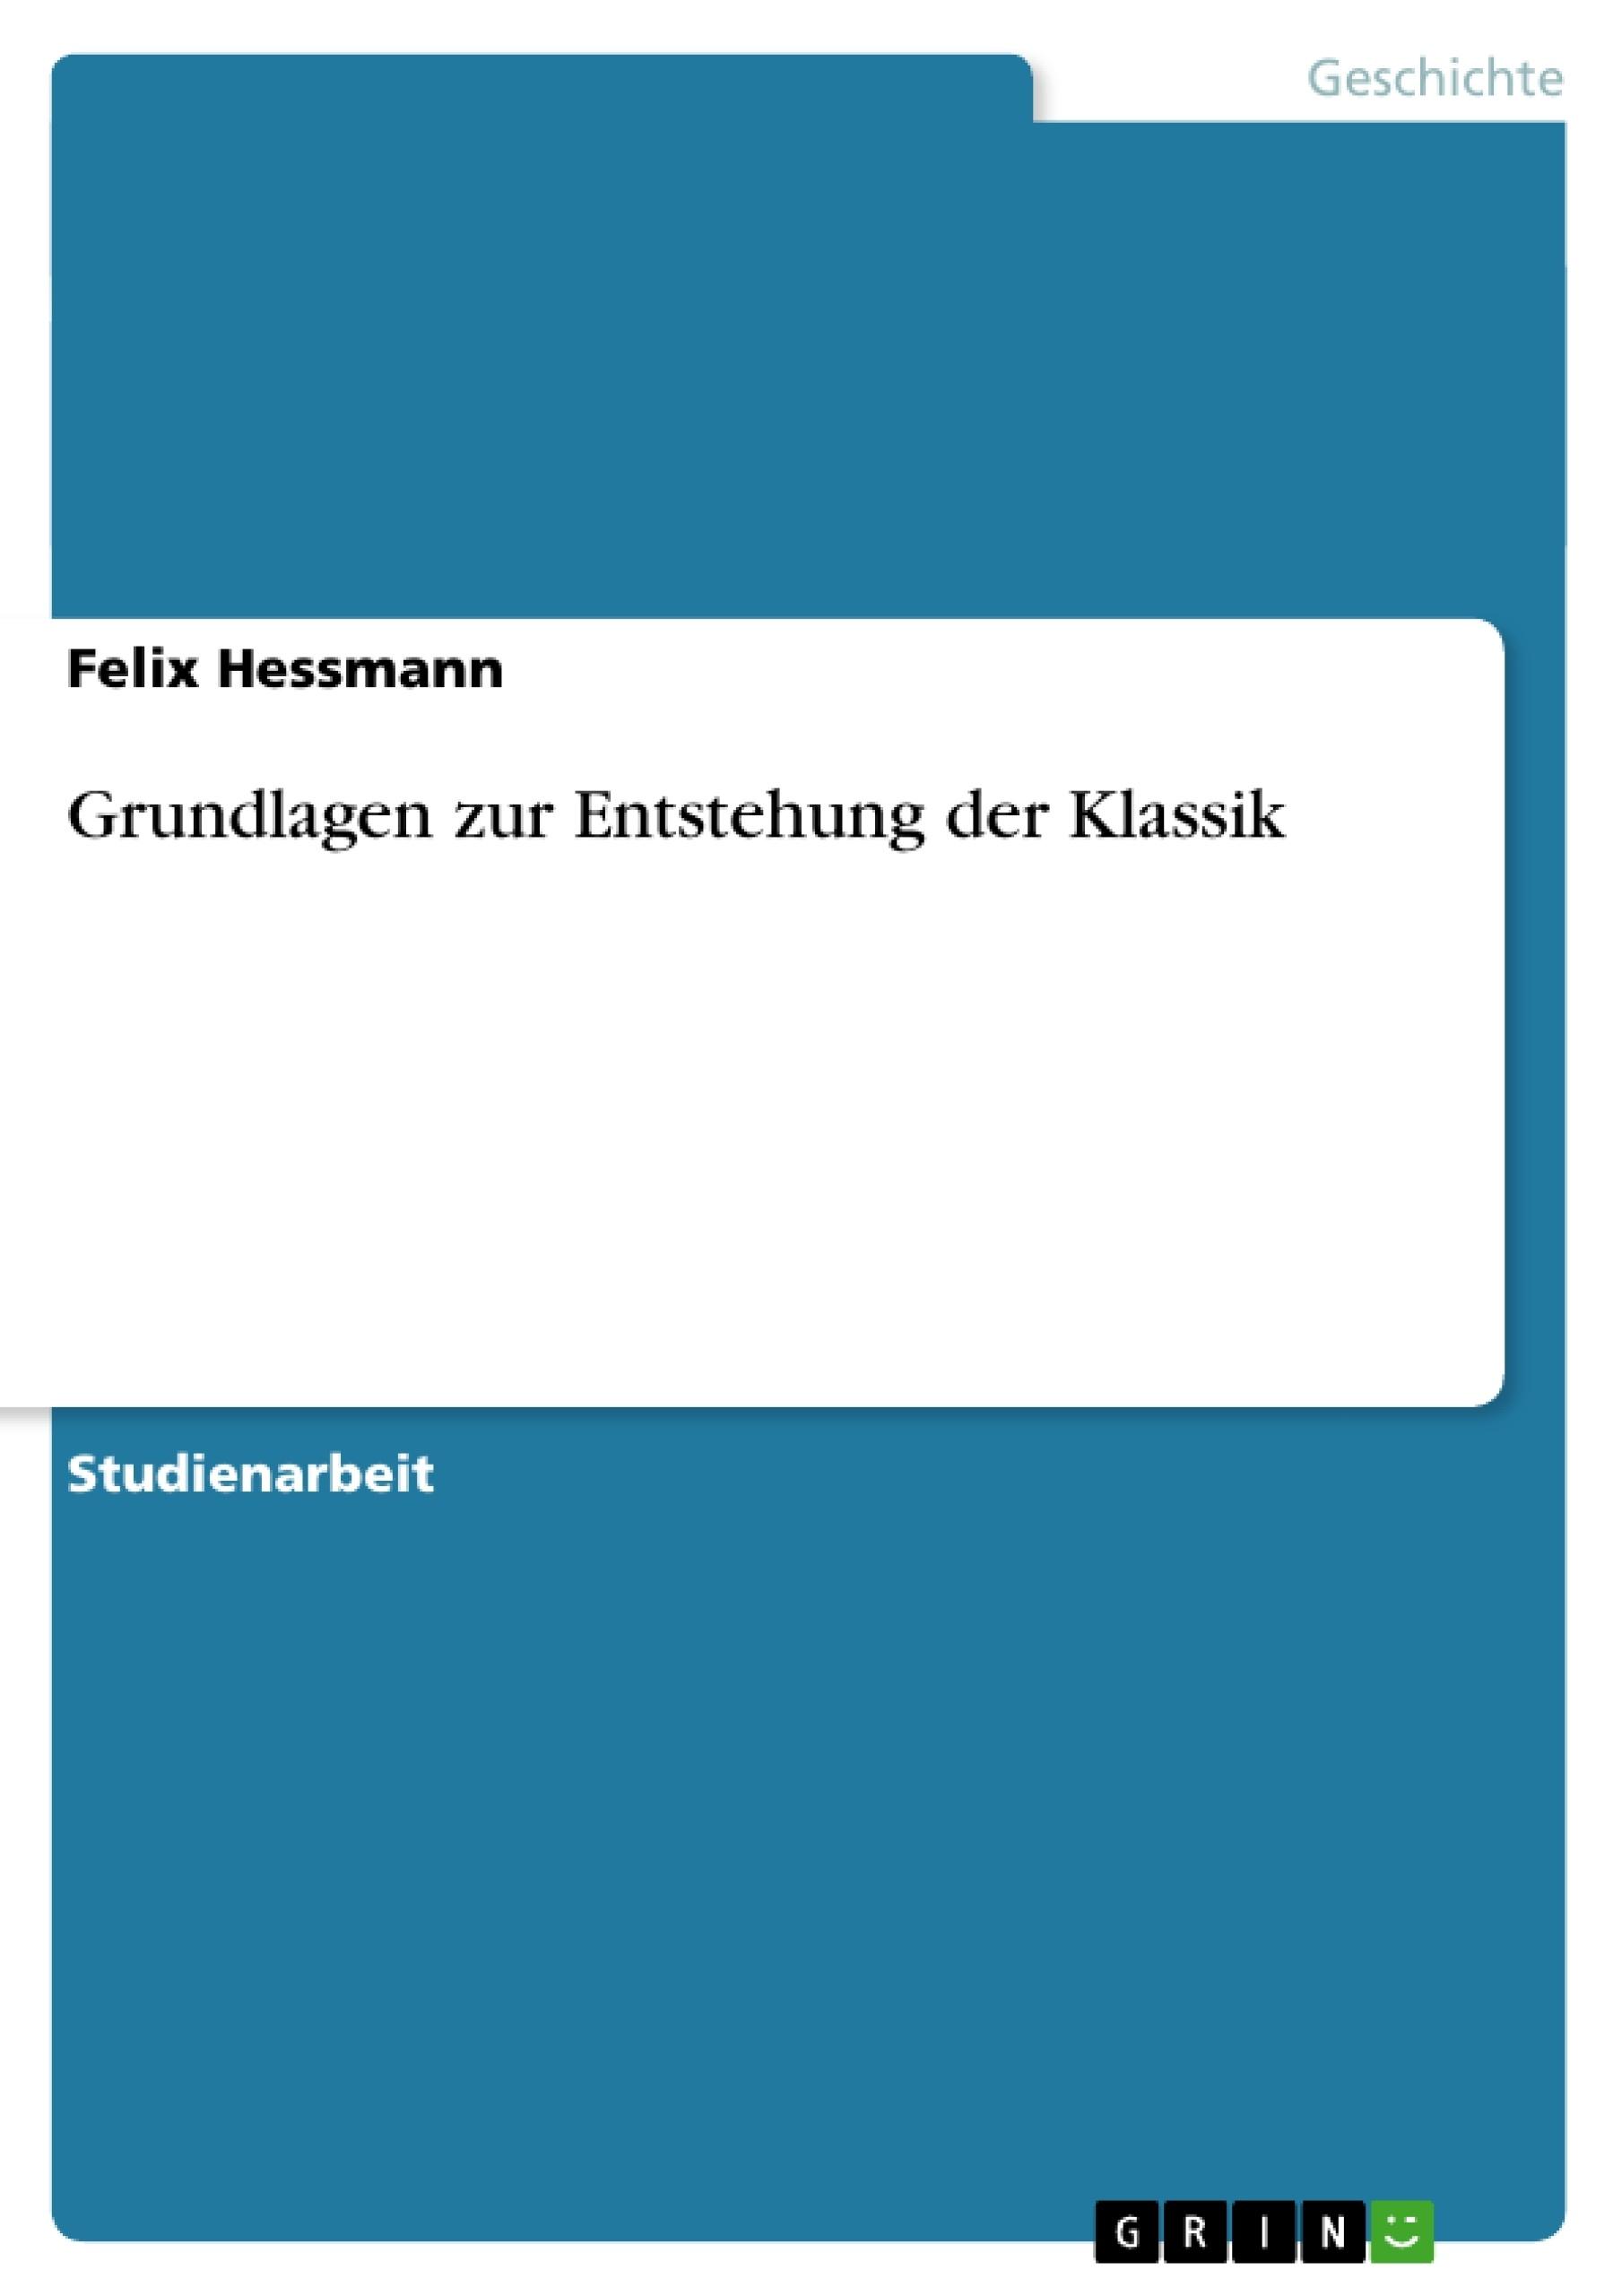 Titel: Grundlagen zur Entstehung der Klassik